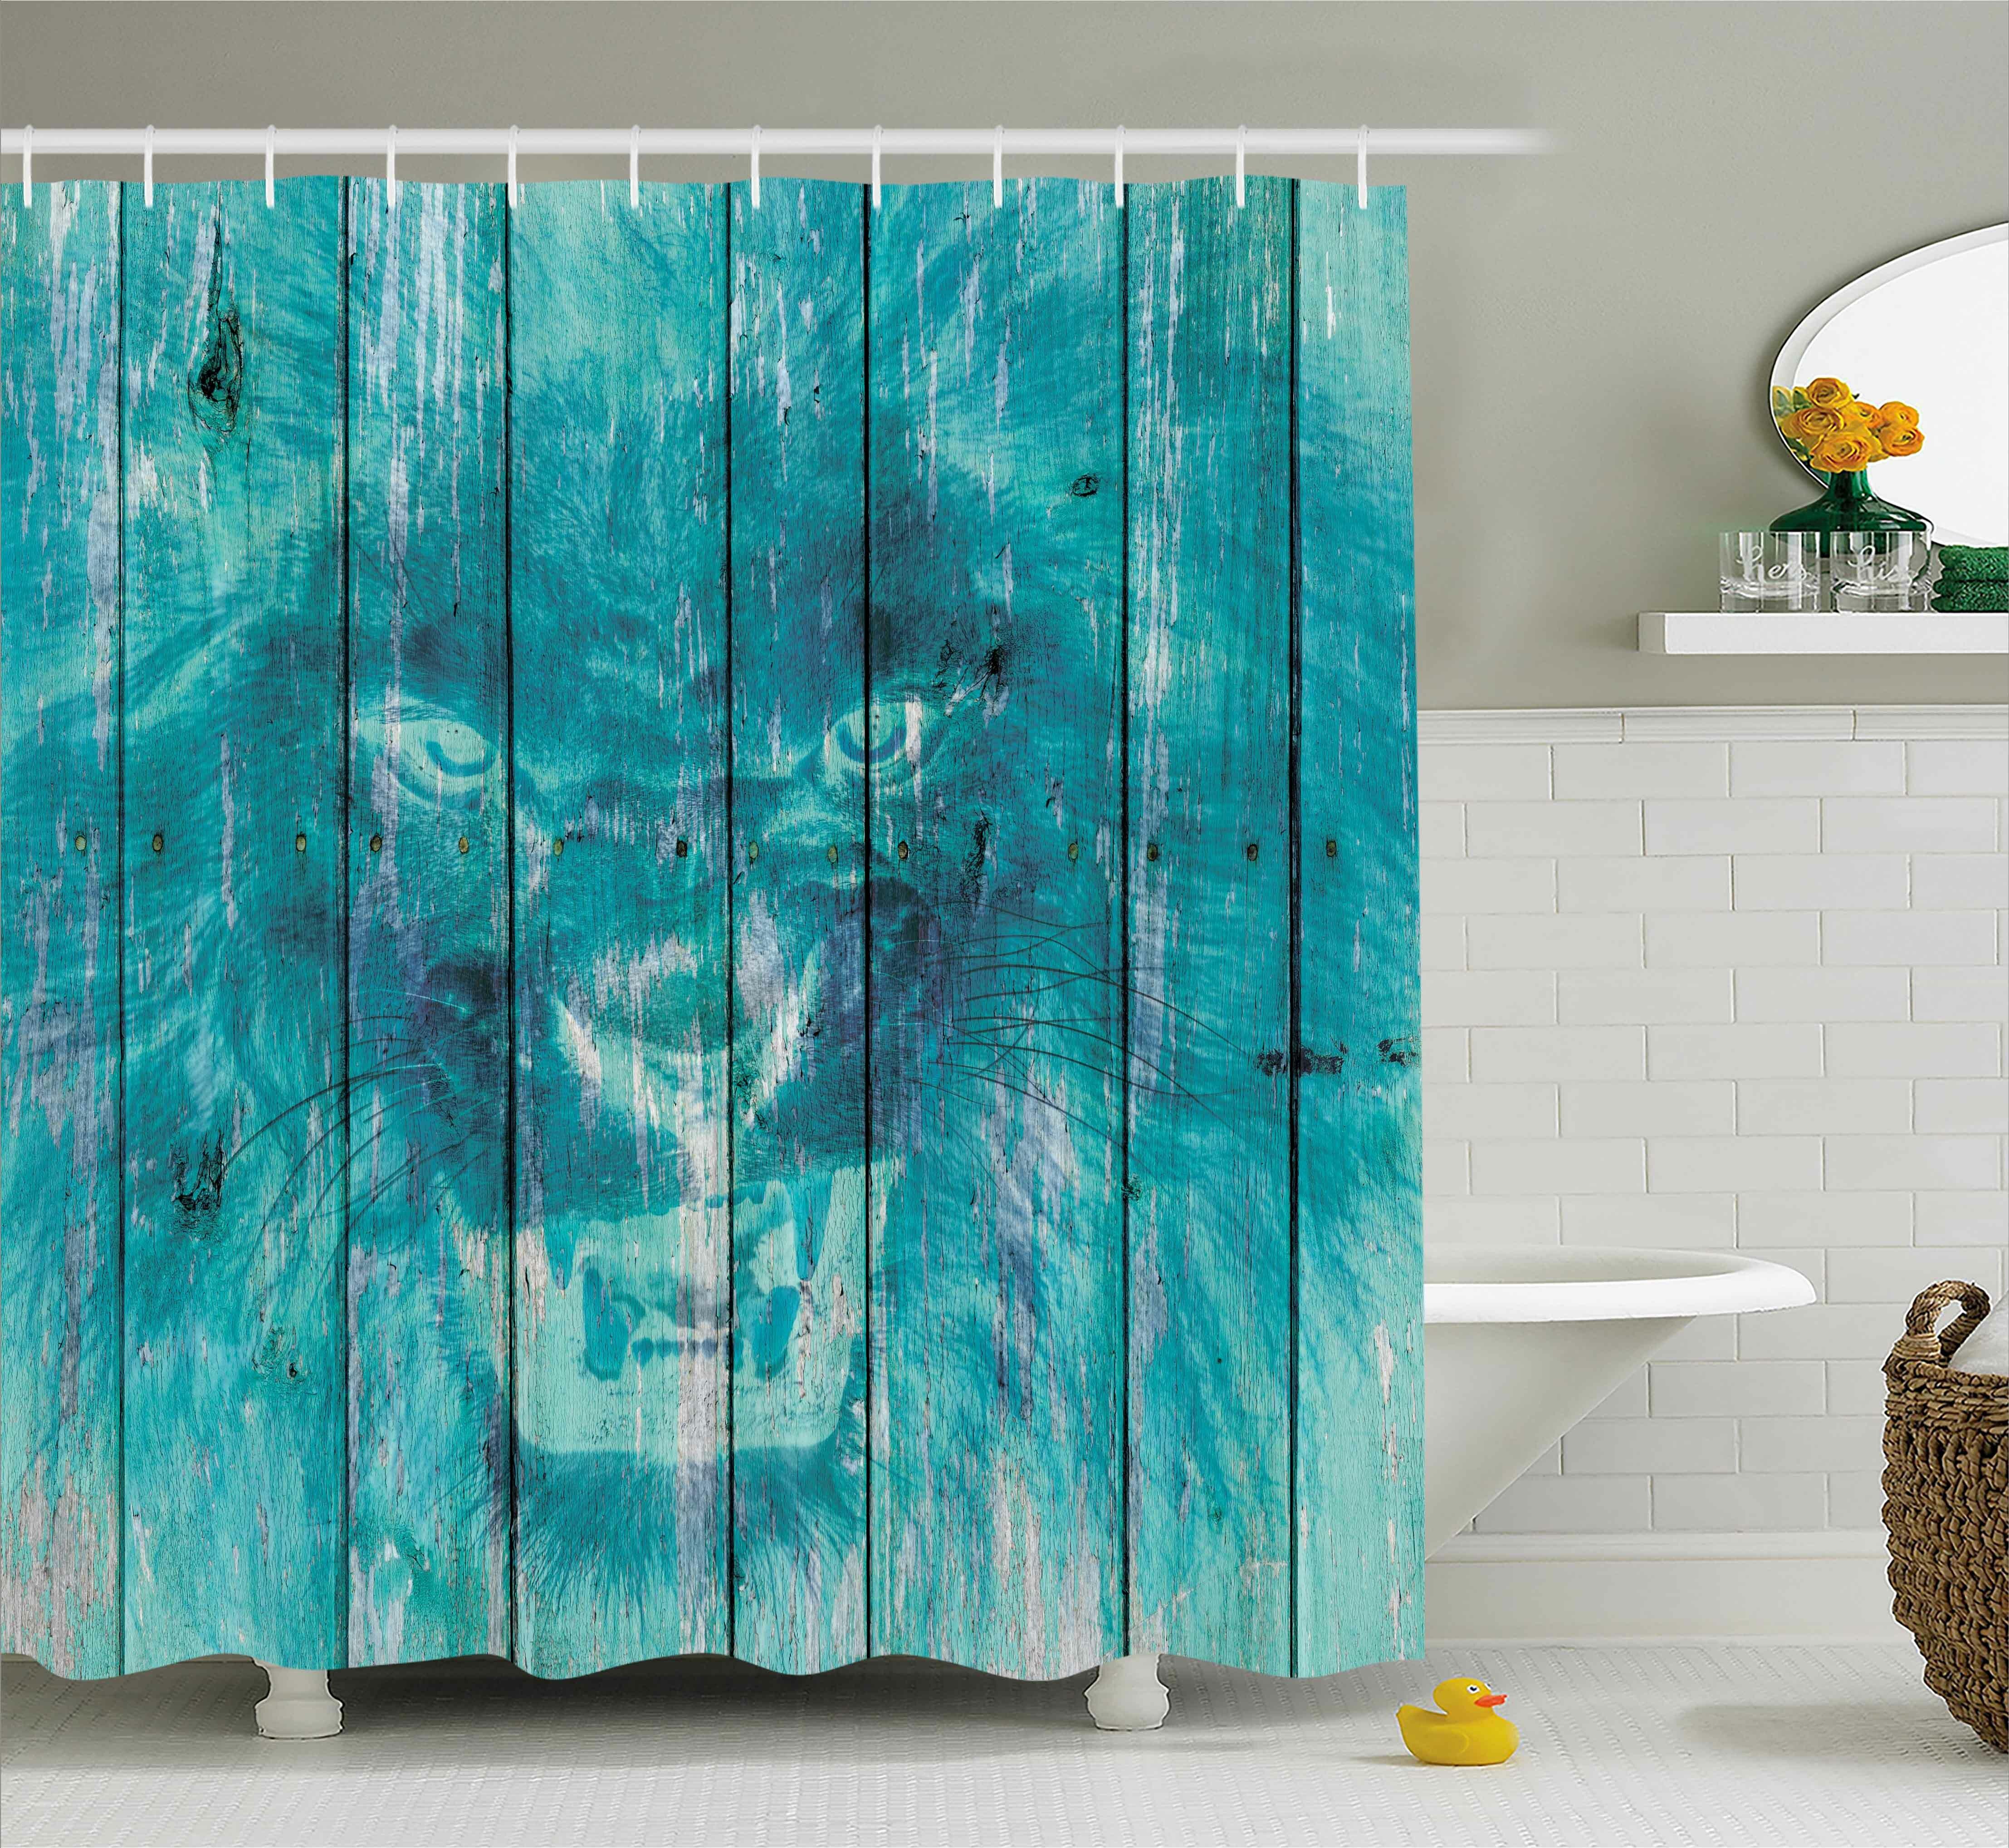 East Urban Home Retro Wooden King Lion Decor Single Shower Curtain Wayfair